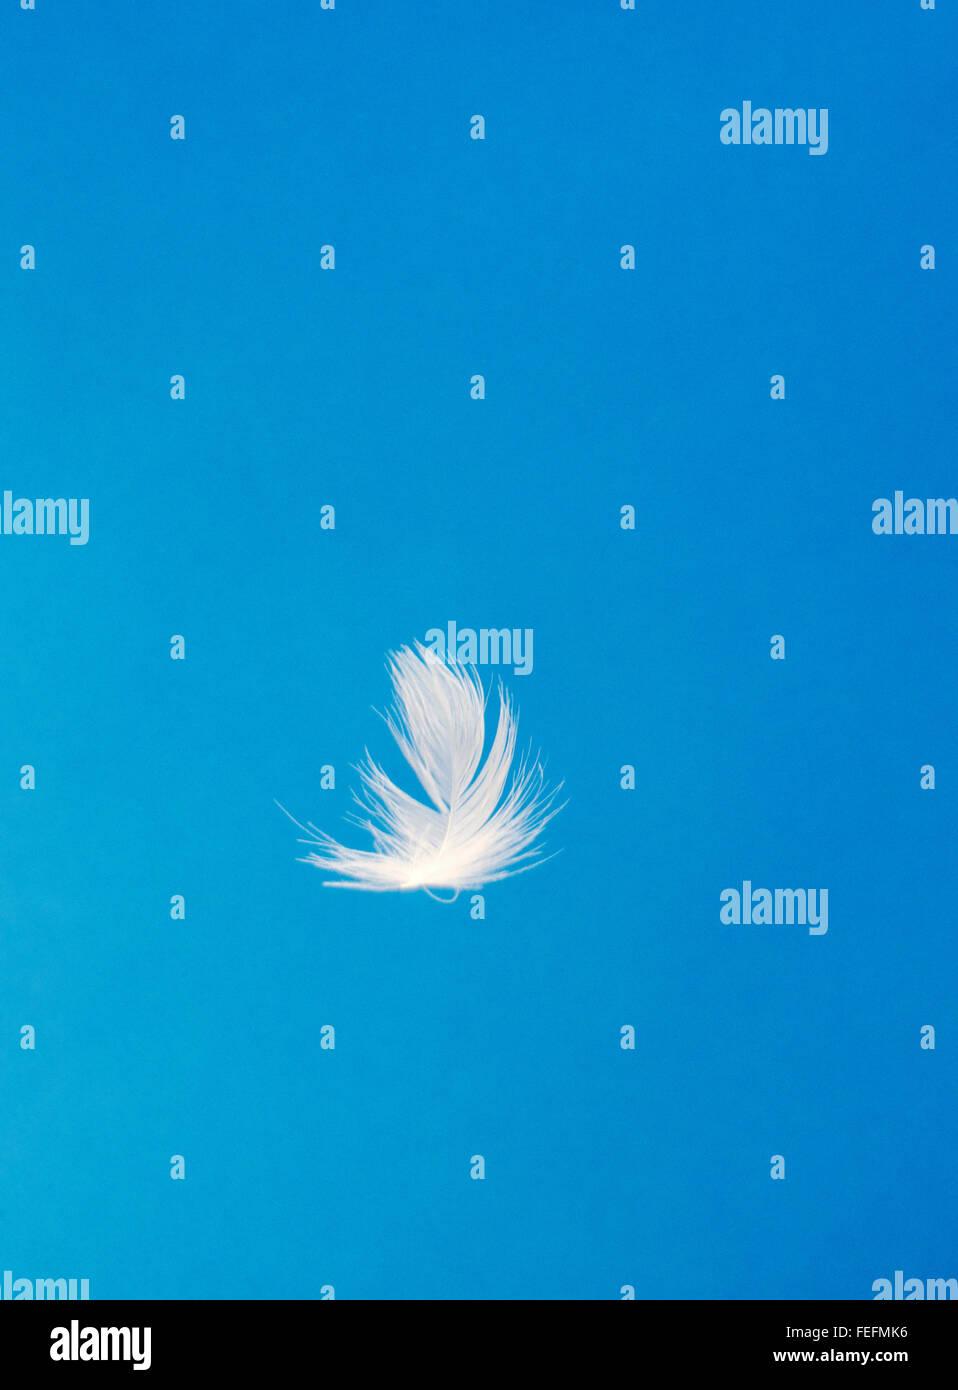 Close-up di oca bianca di piume floating contro un cielo blu Immagini Stock